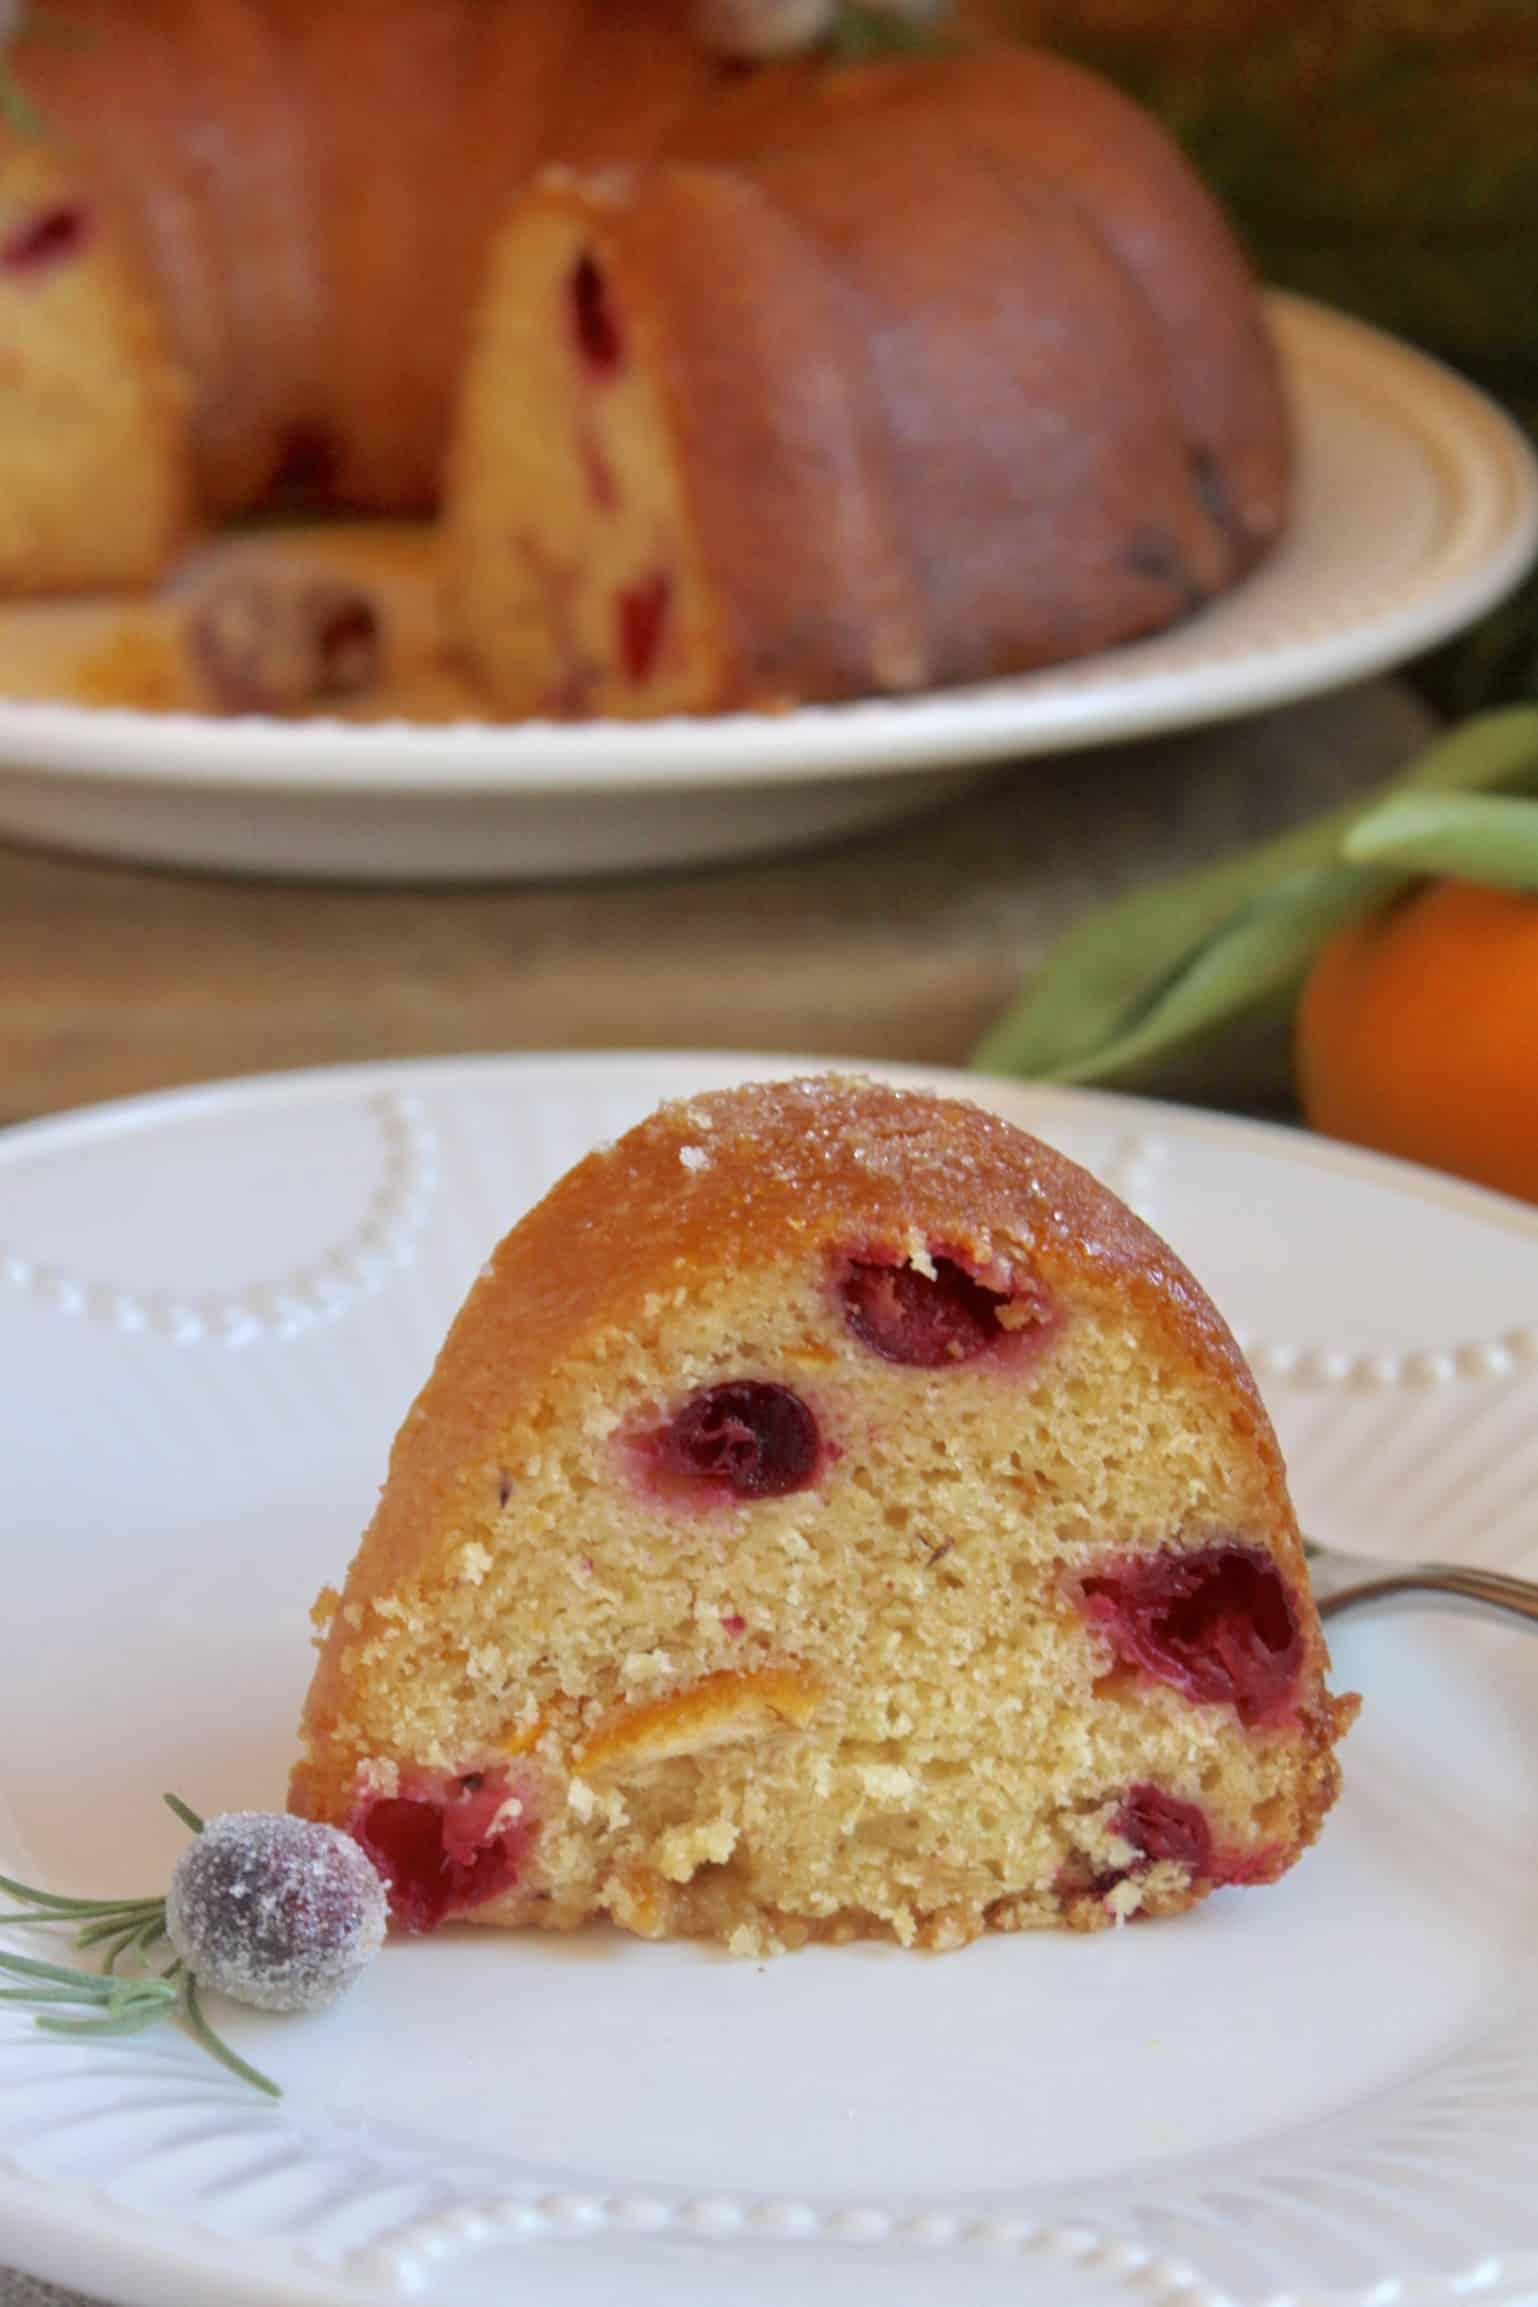 slice of orange cranberry cake